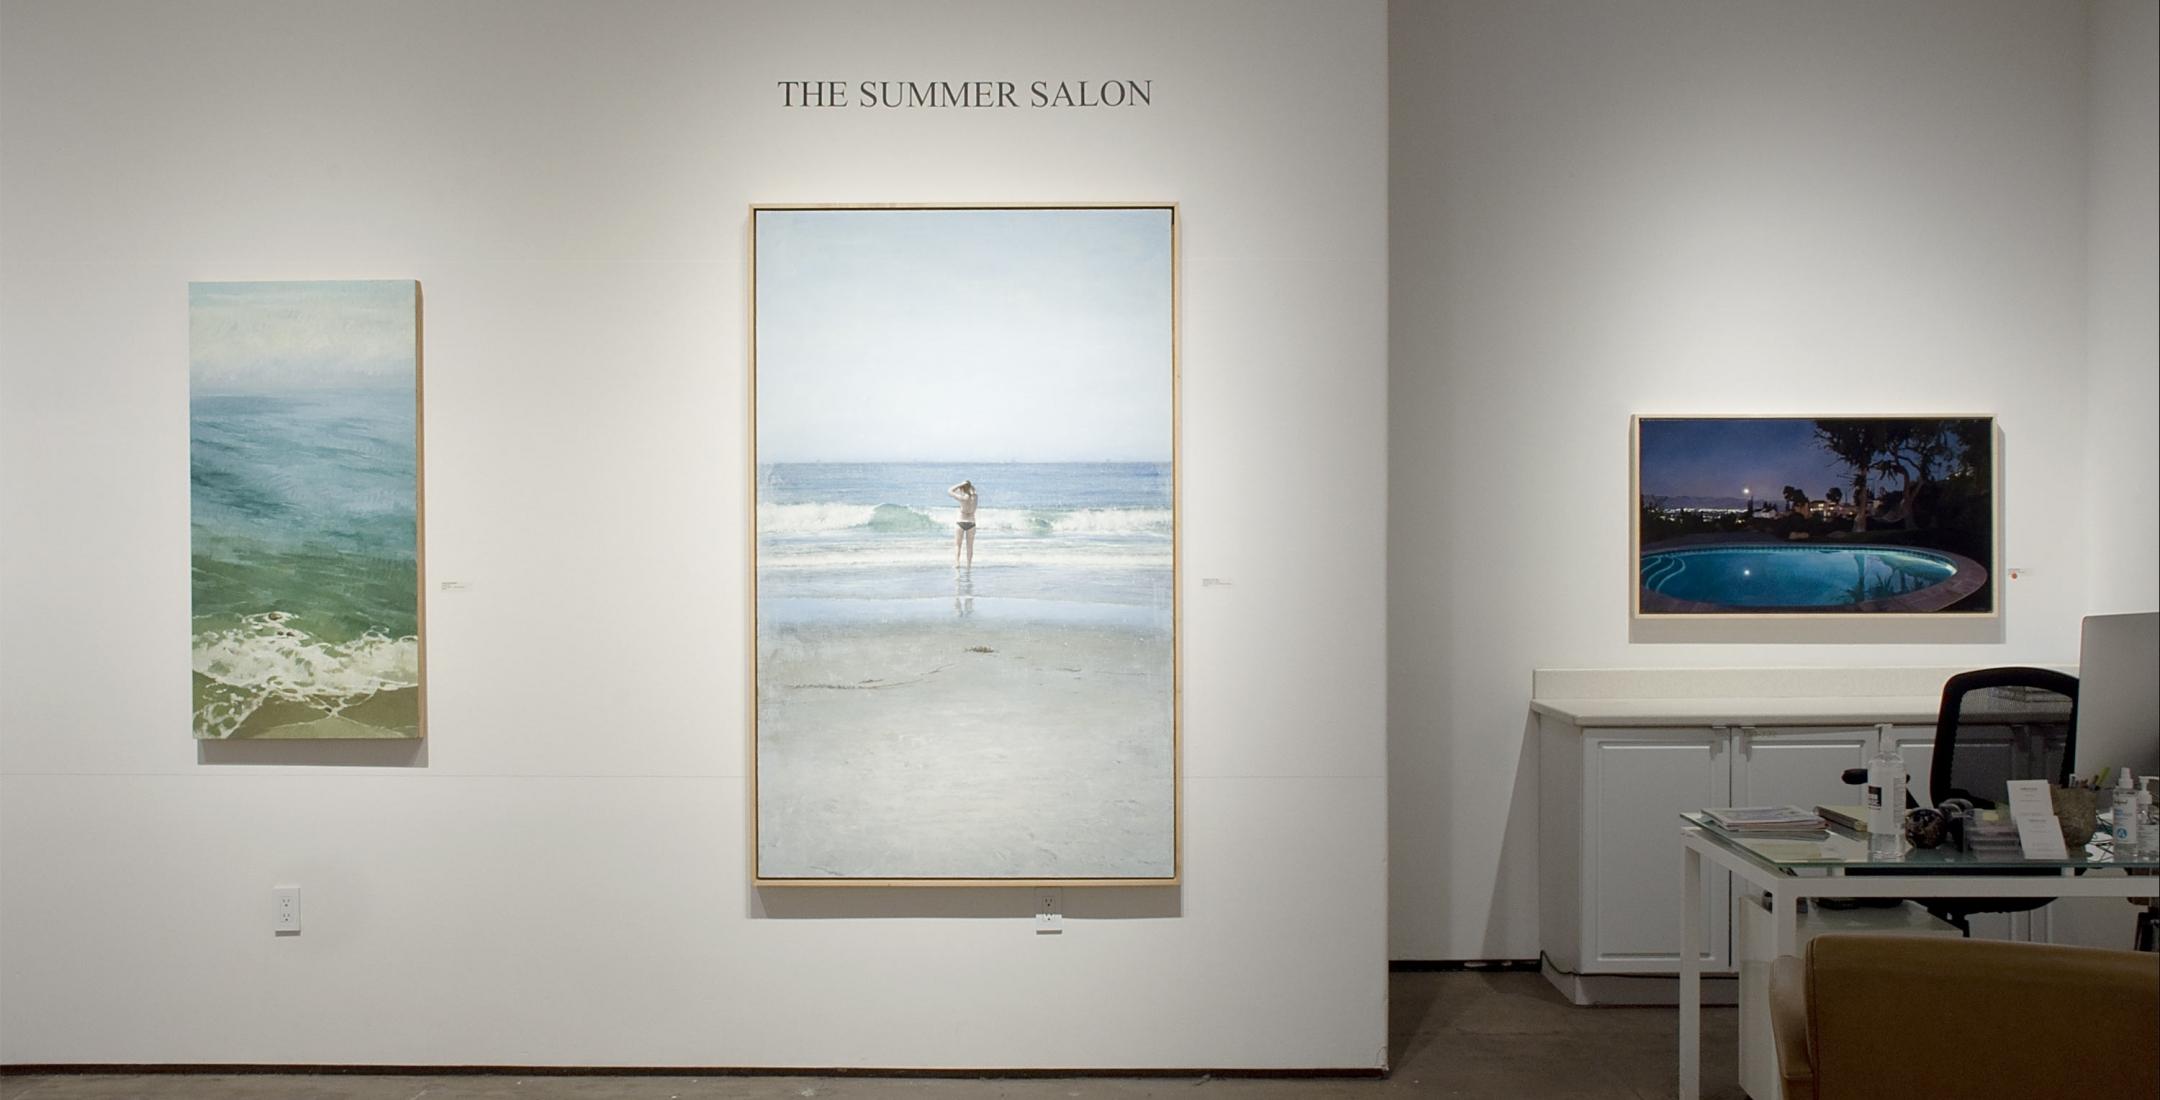 The Summer Salon, 2021